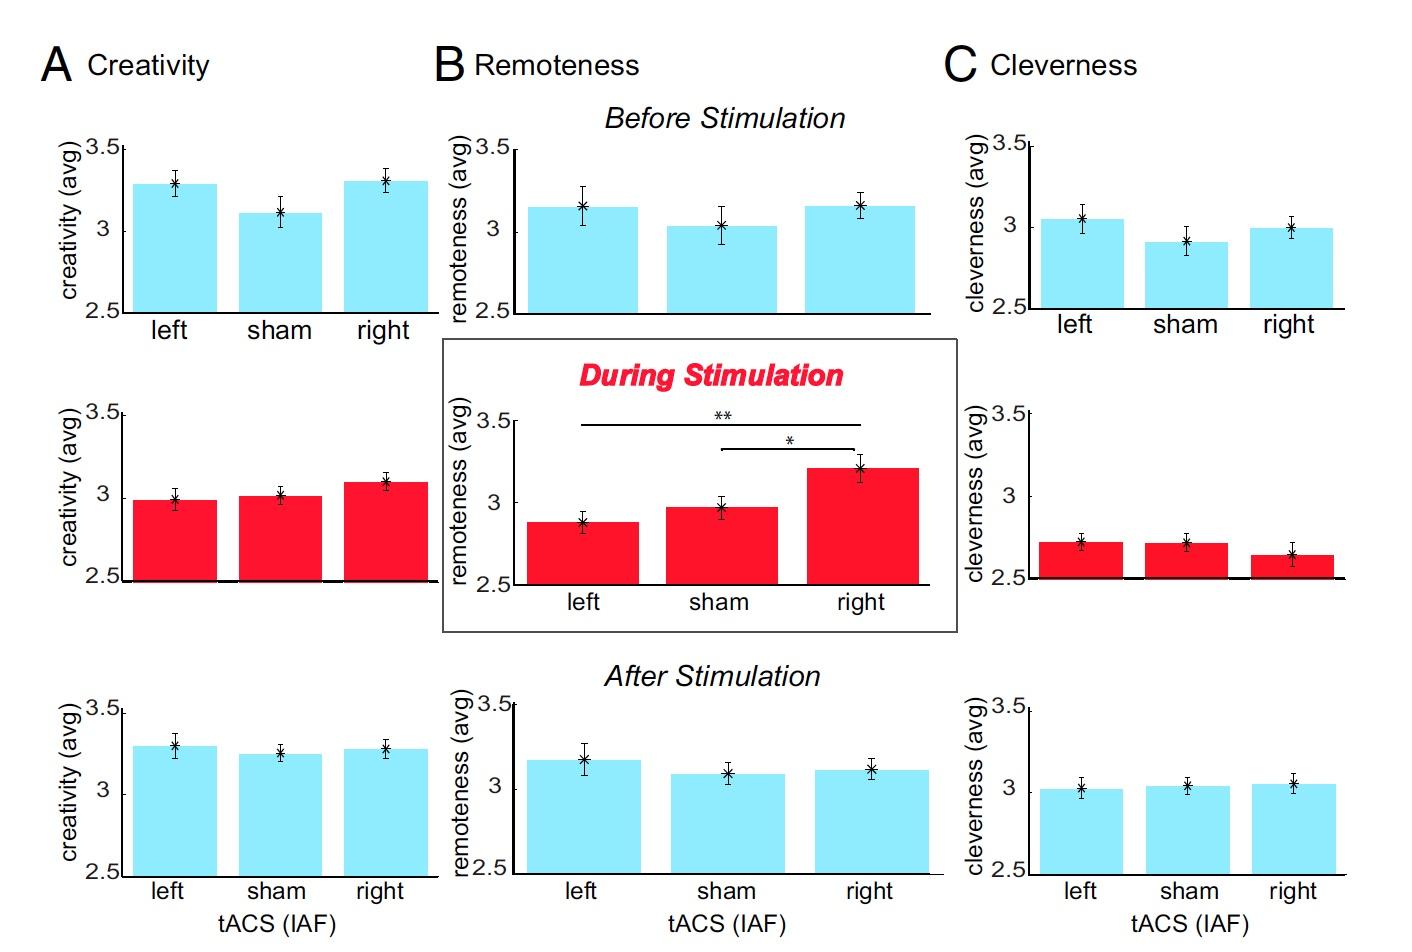 Откуда берется креативность: анализ активности альфа-волн мозга во время RAT-тестов - 9